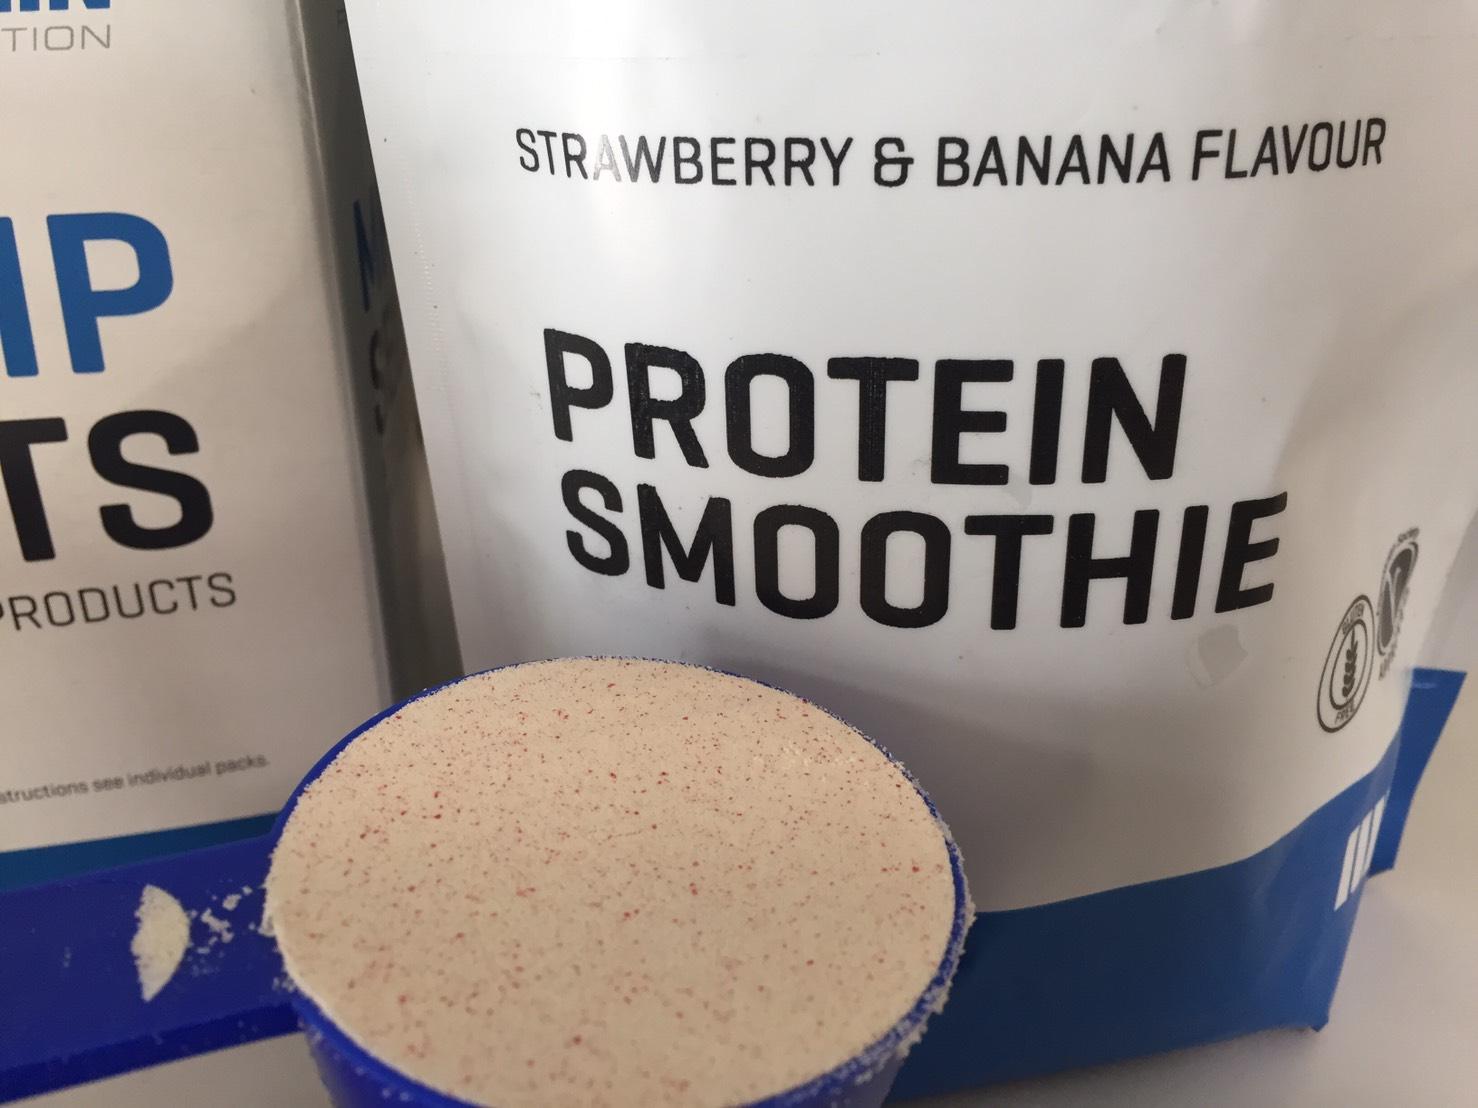 Protein Smoothie(プロテイン・スムージー)「STRAWBERRY & BANANA FLAVOUR(ストロベリー&バナナ味)」